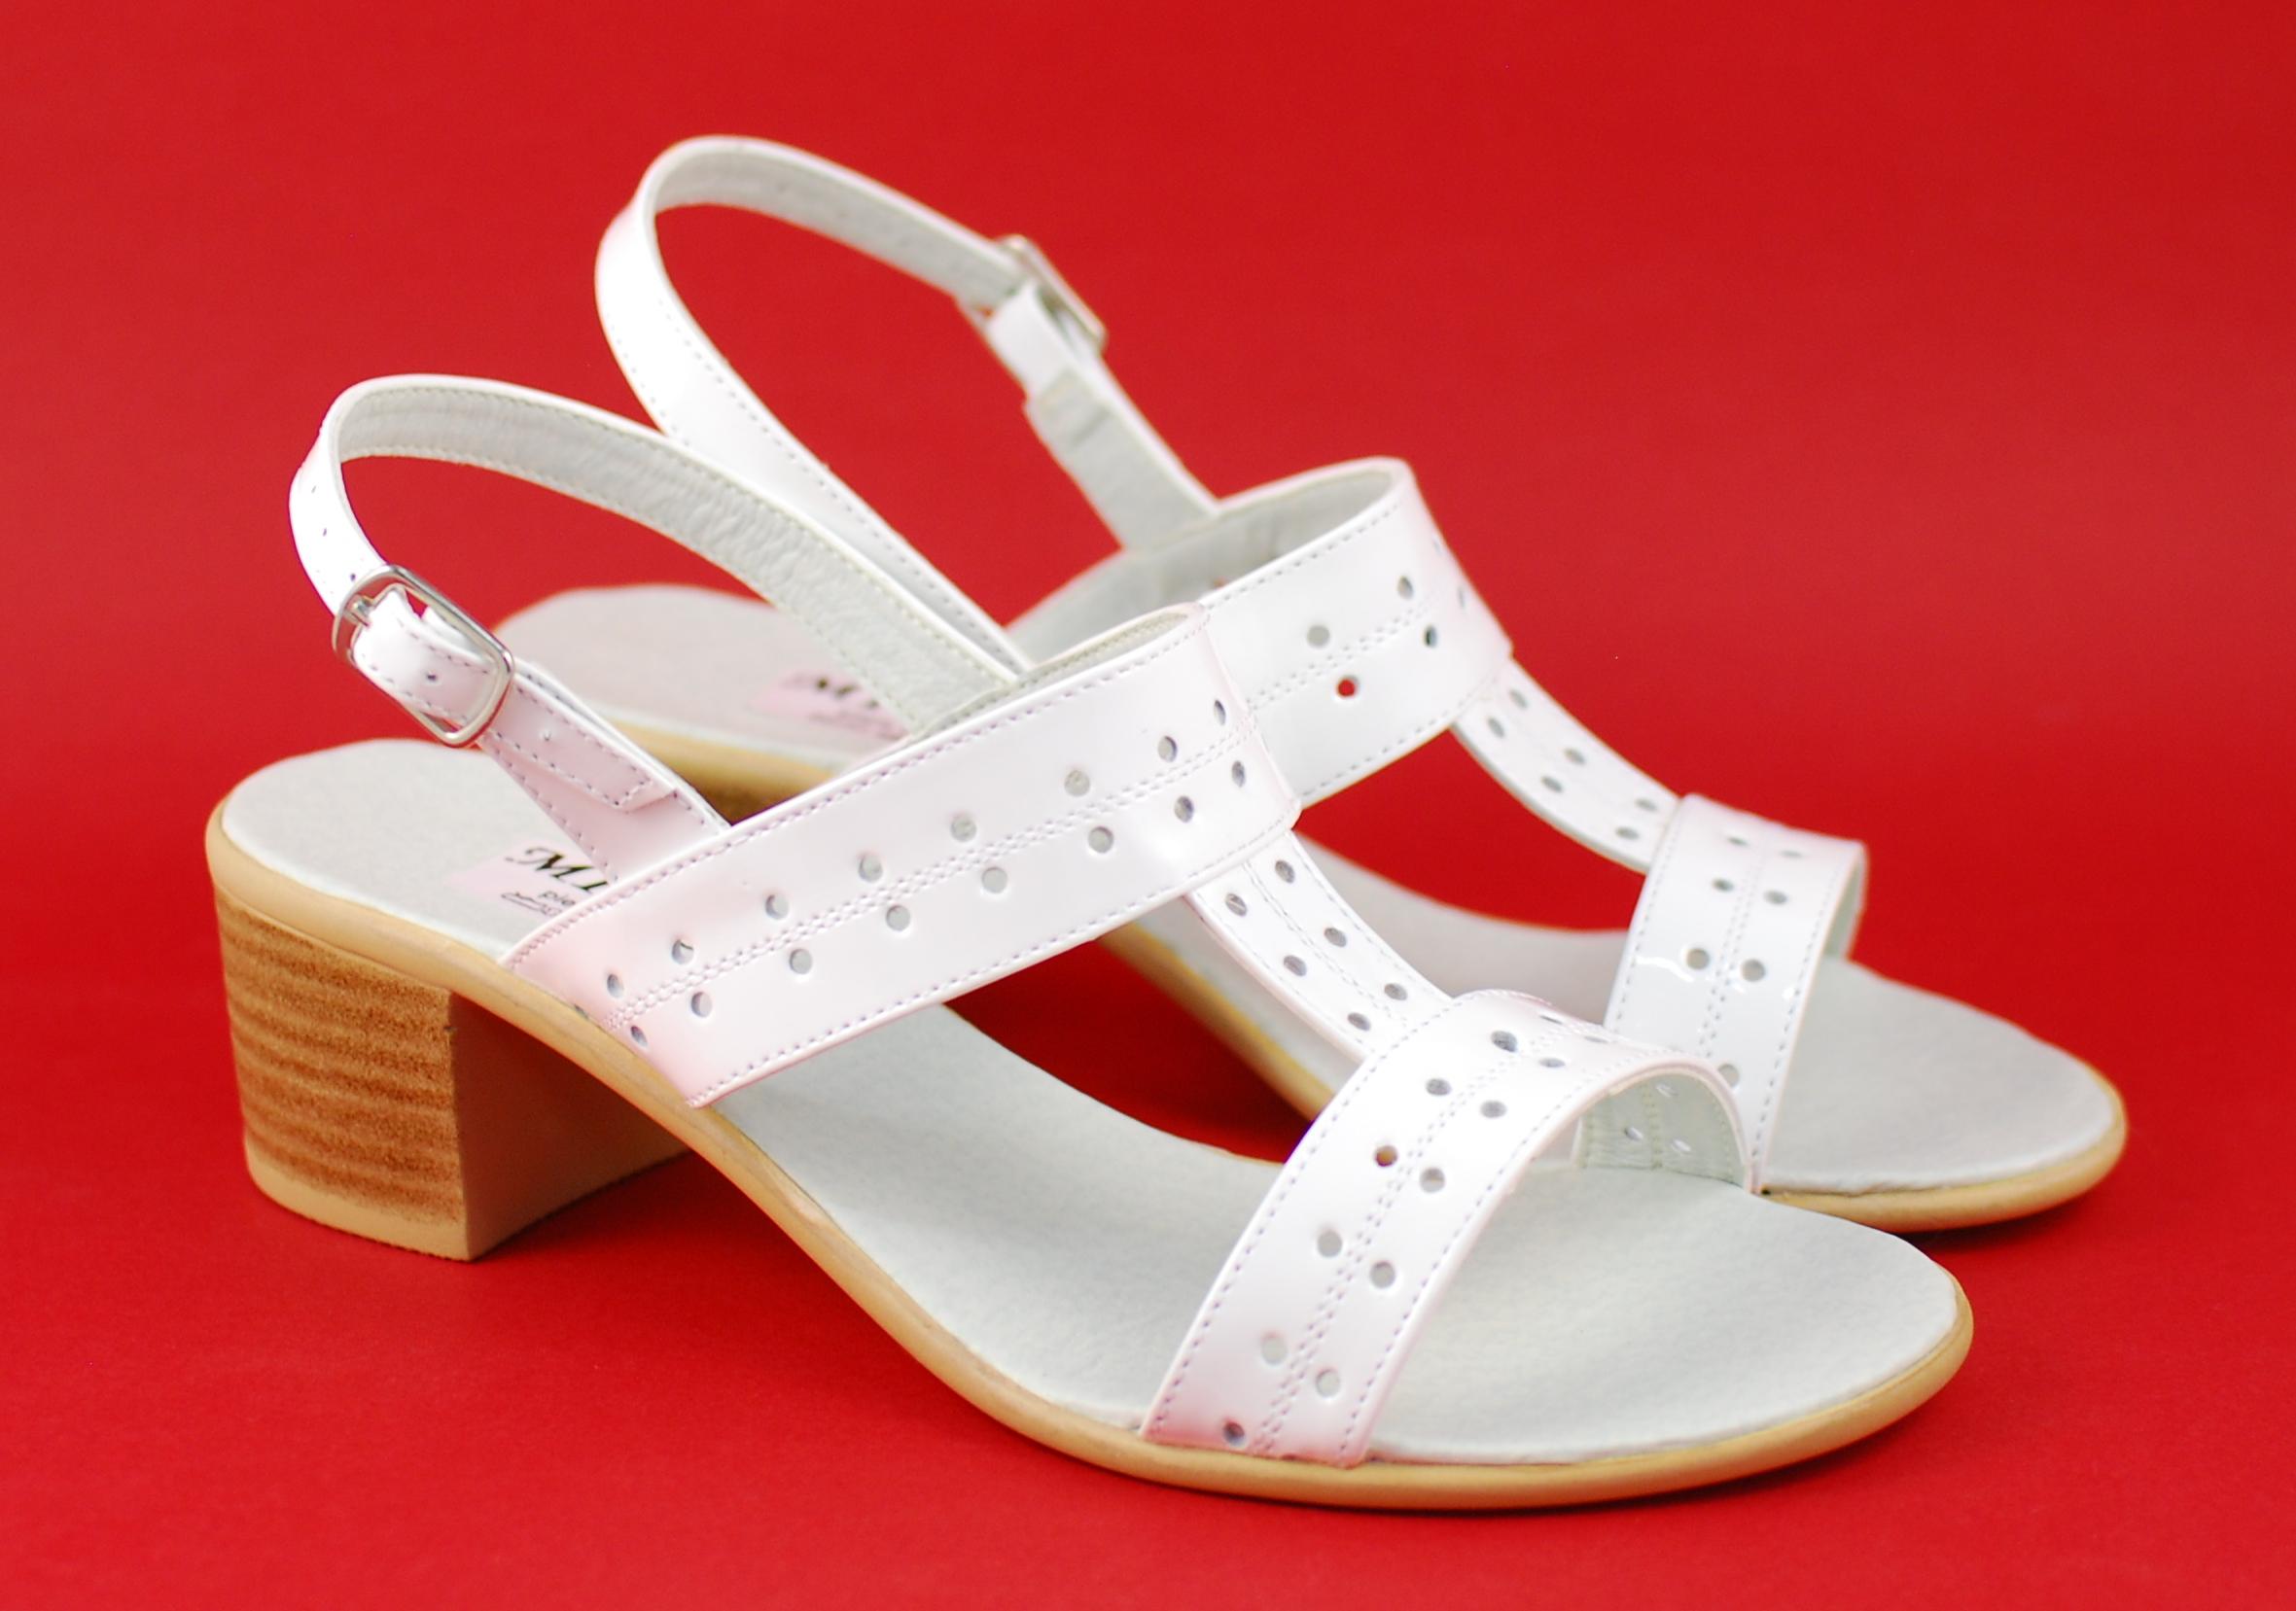 Sandale dama albe, din piele naturala lacuita S7ALBLAC